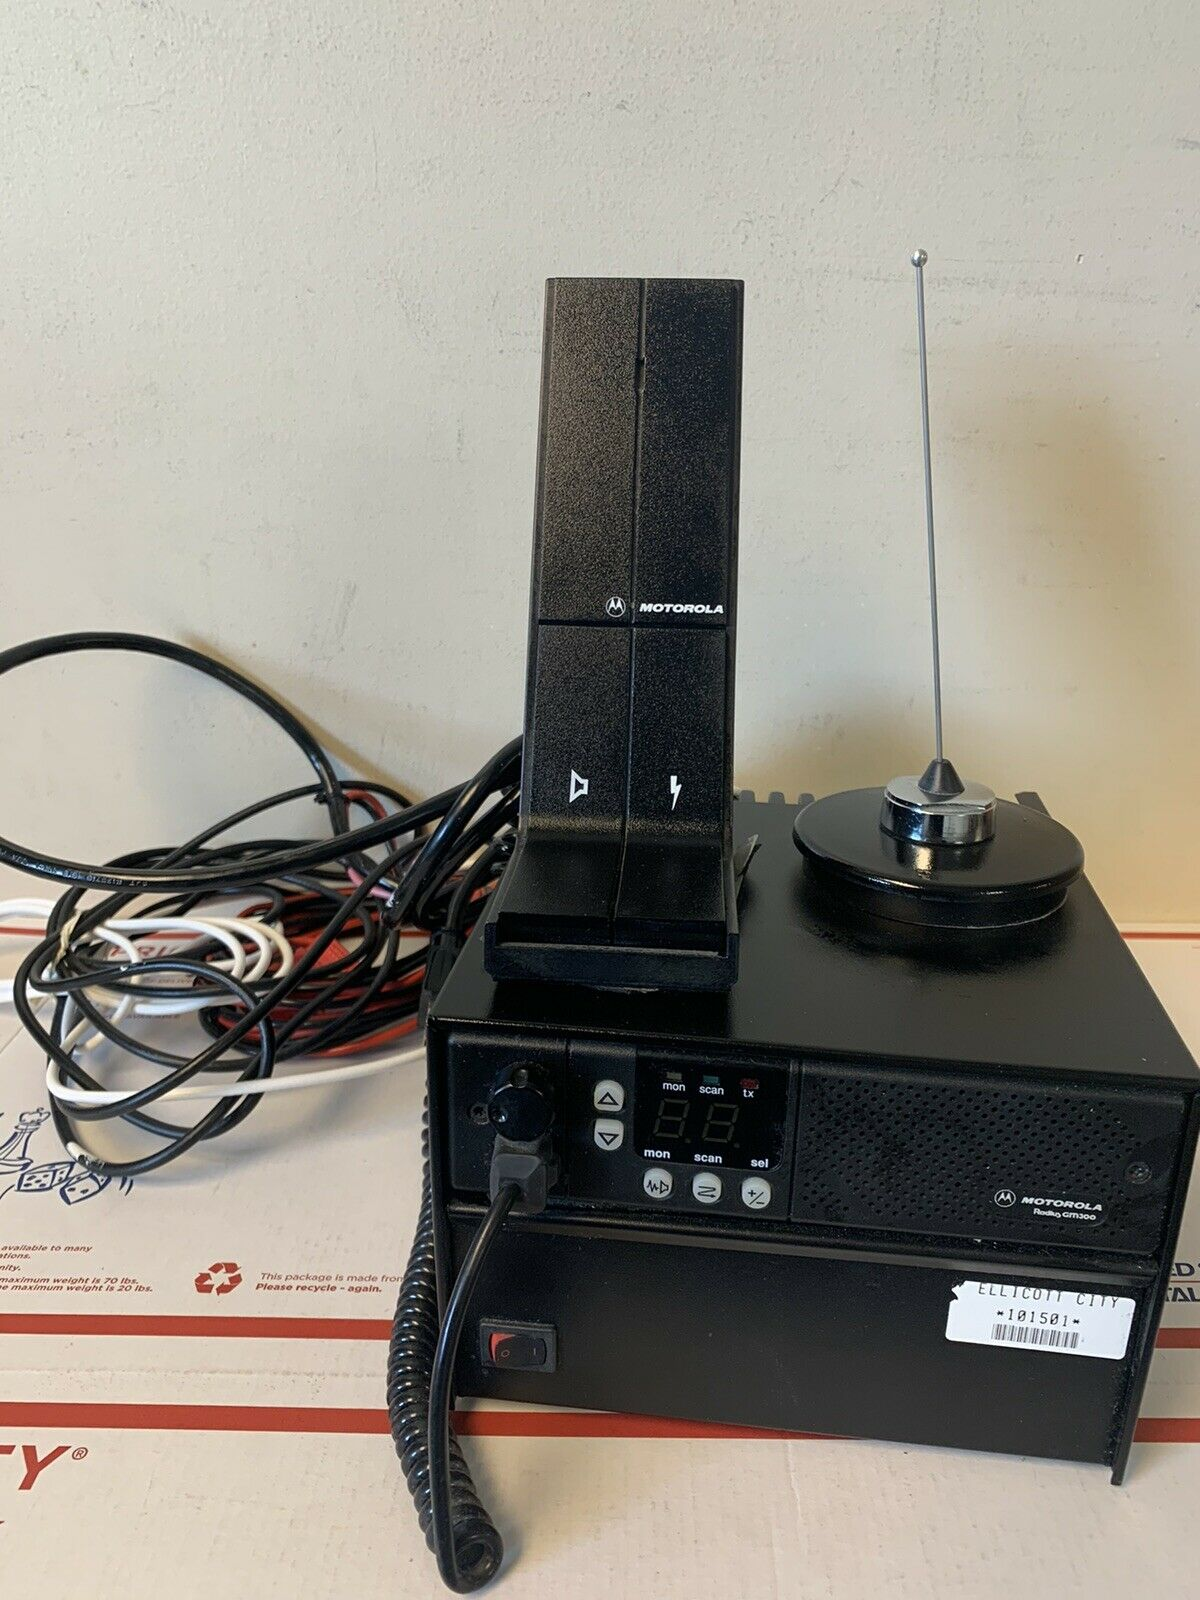 Motorola Radio Base Station Motorola GM300 Radio  w/Power supply and Accessories. Buy it now for 269.95